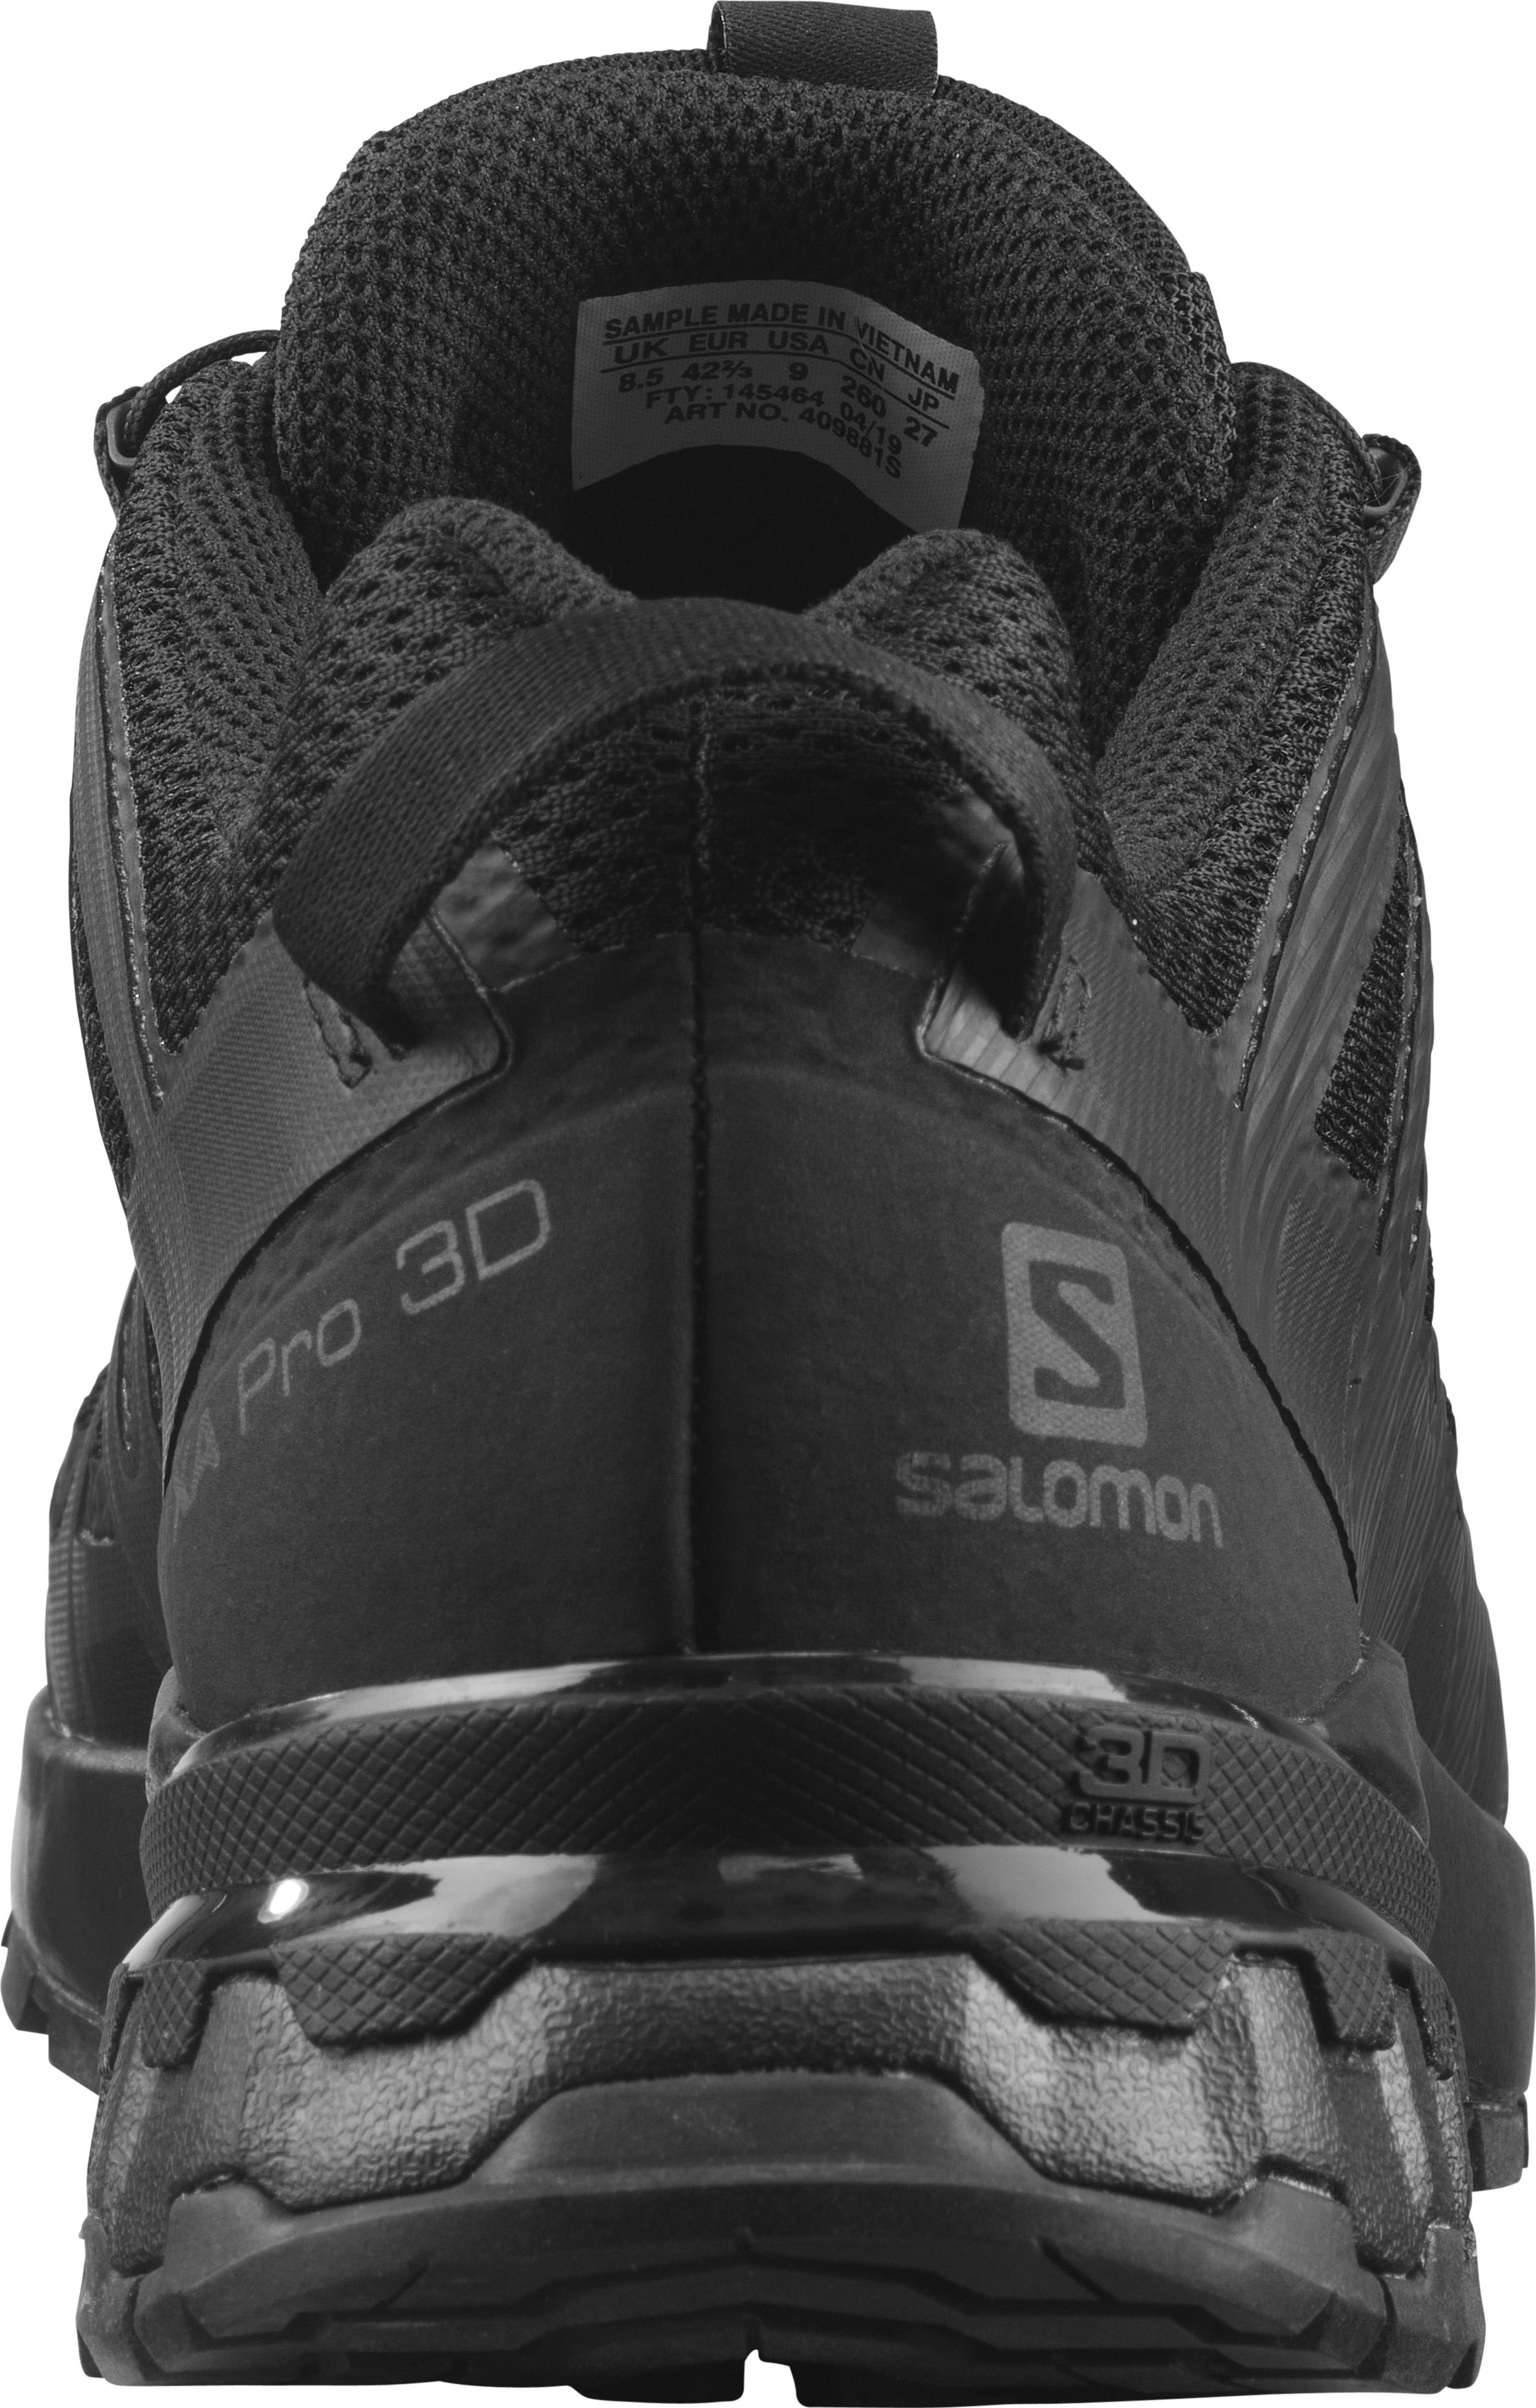 Salomon XA PRO 3D V8